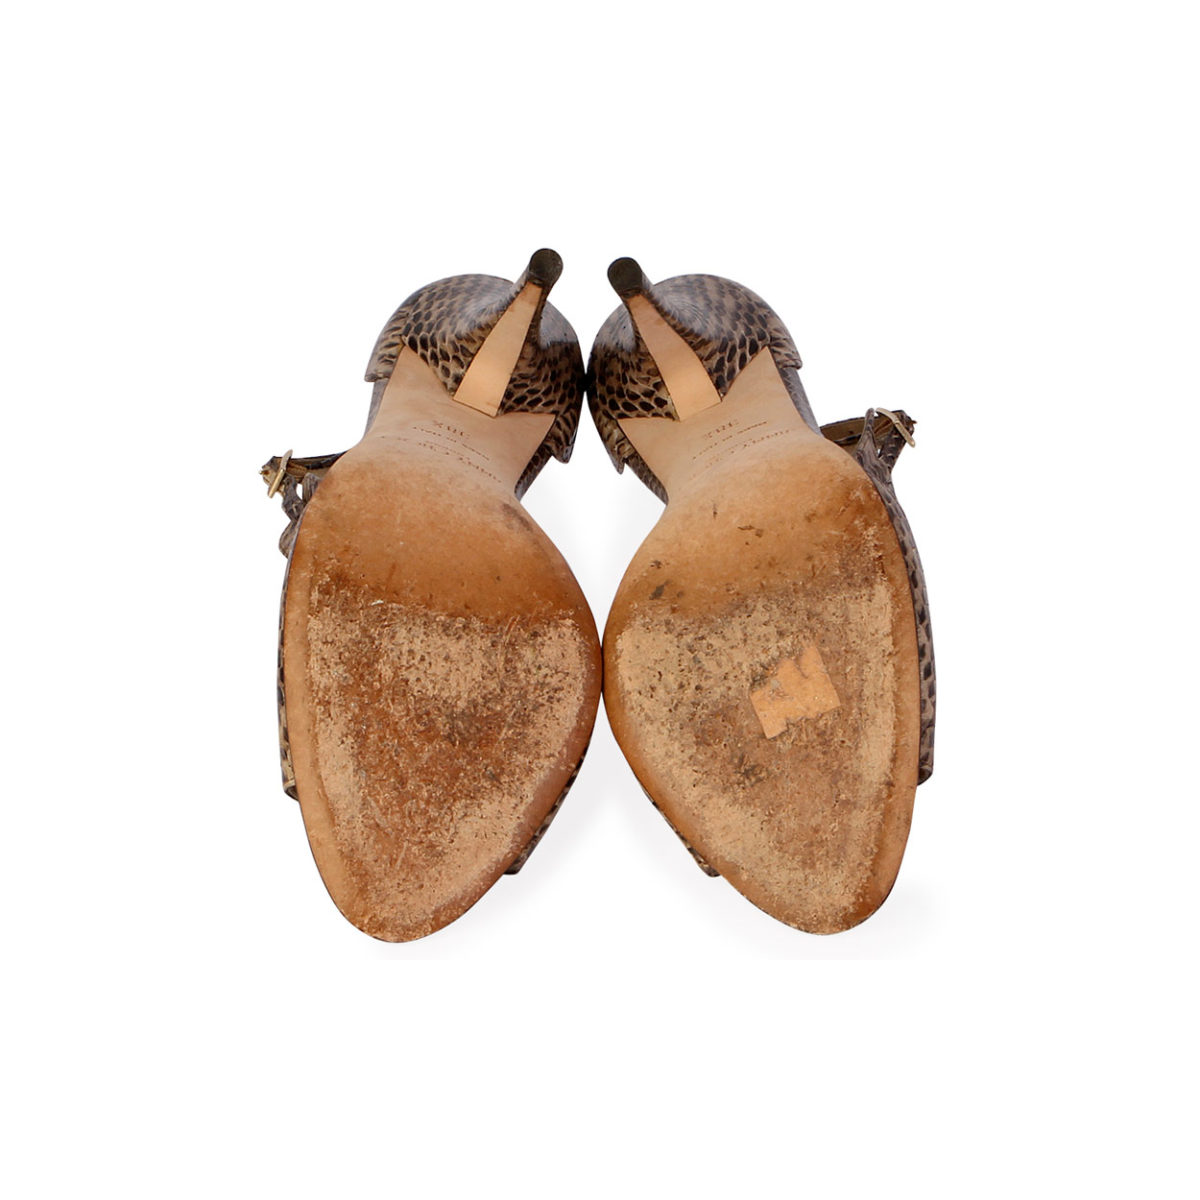 1ea32df0ced3 JIMMY CHOO Snake Skin Ankle Strap Open Toe Sandals - S  38.5 (5.5 ...